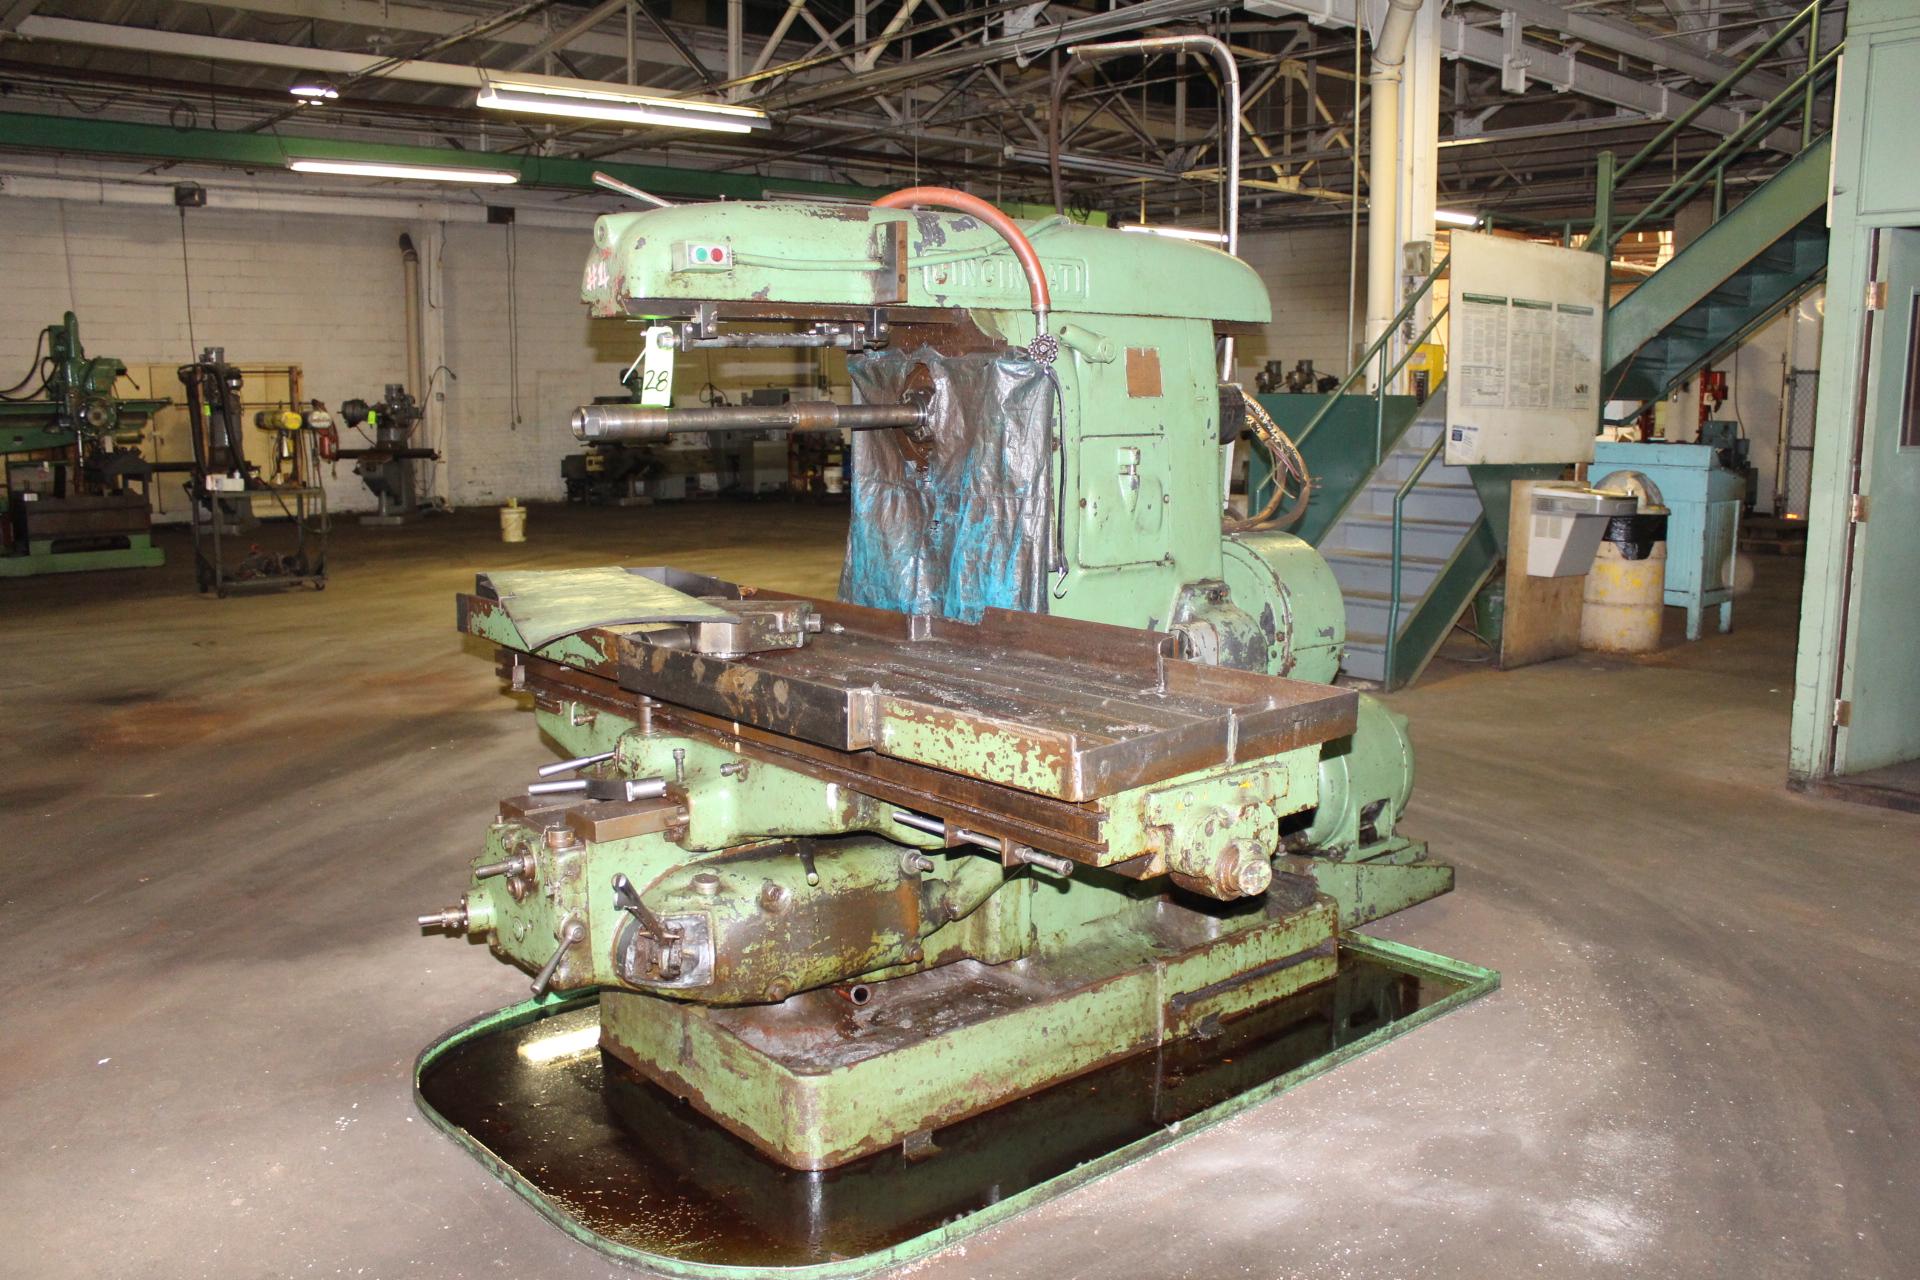 Lot 28 - Cincinnati No. 5 Plain Horizontal Milling Machine